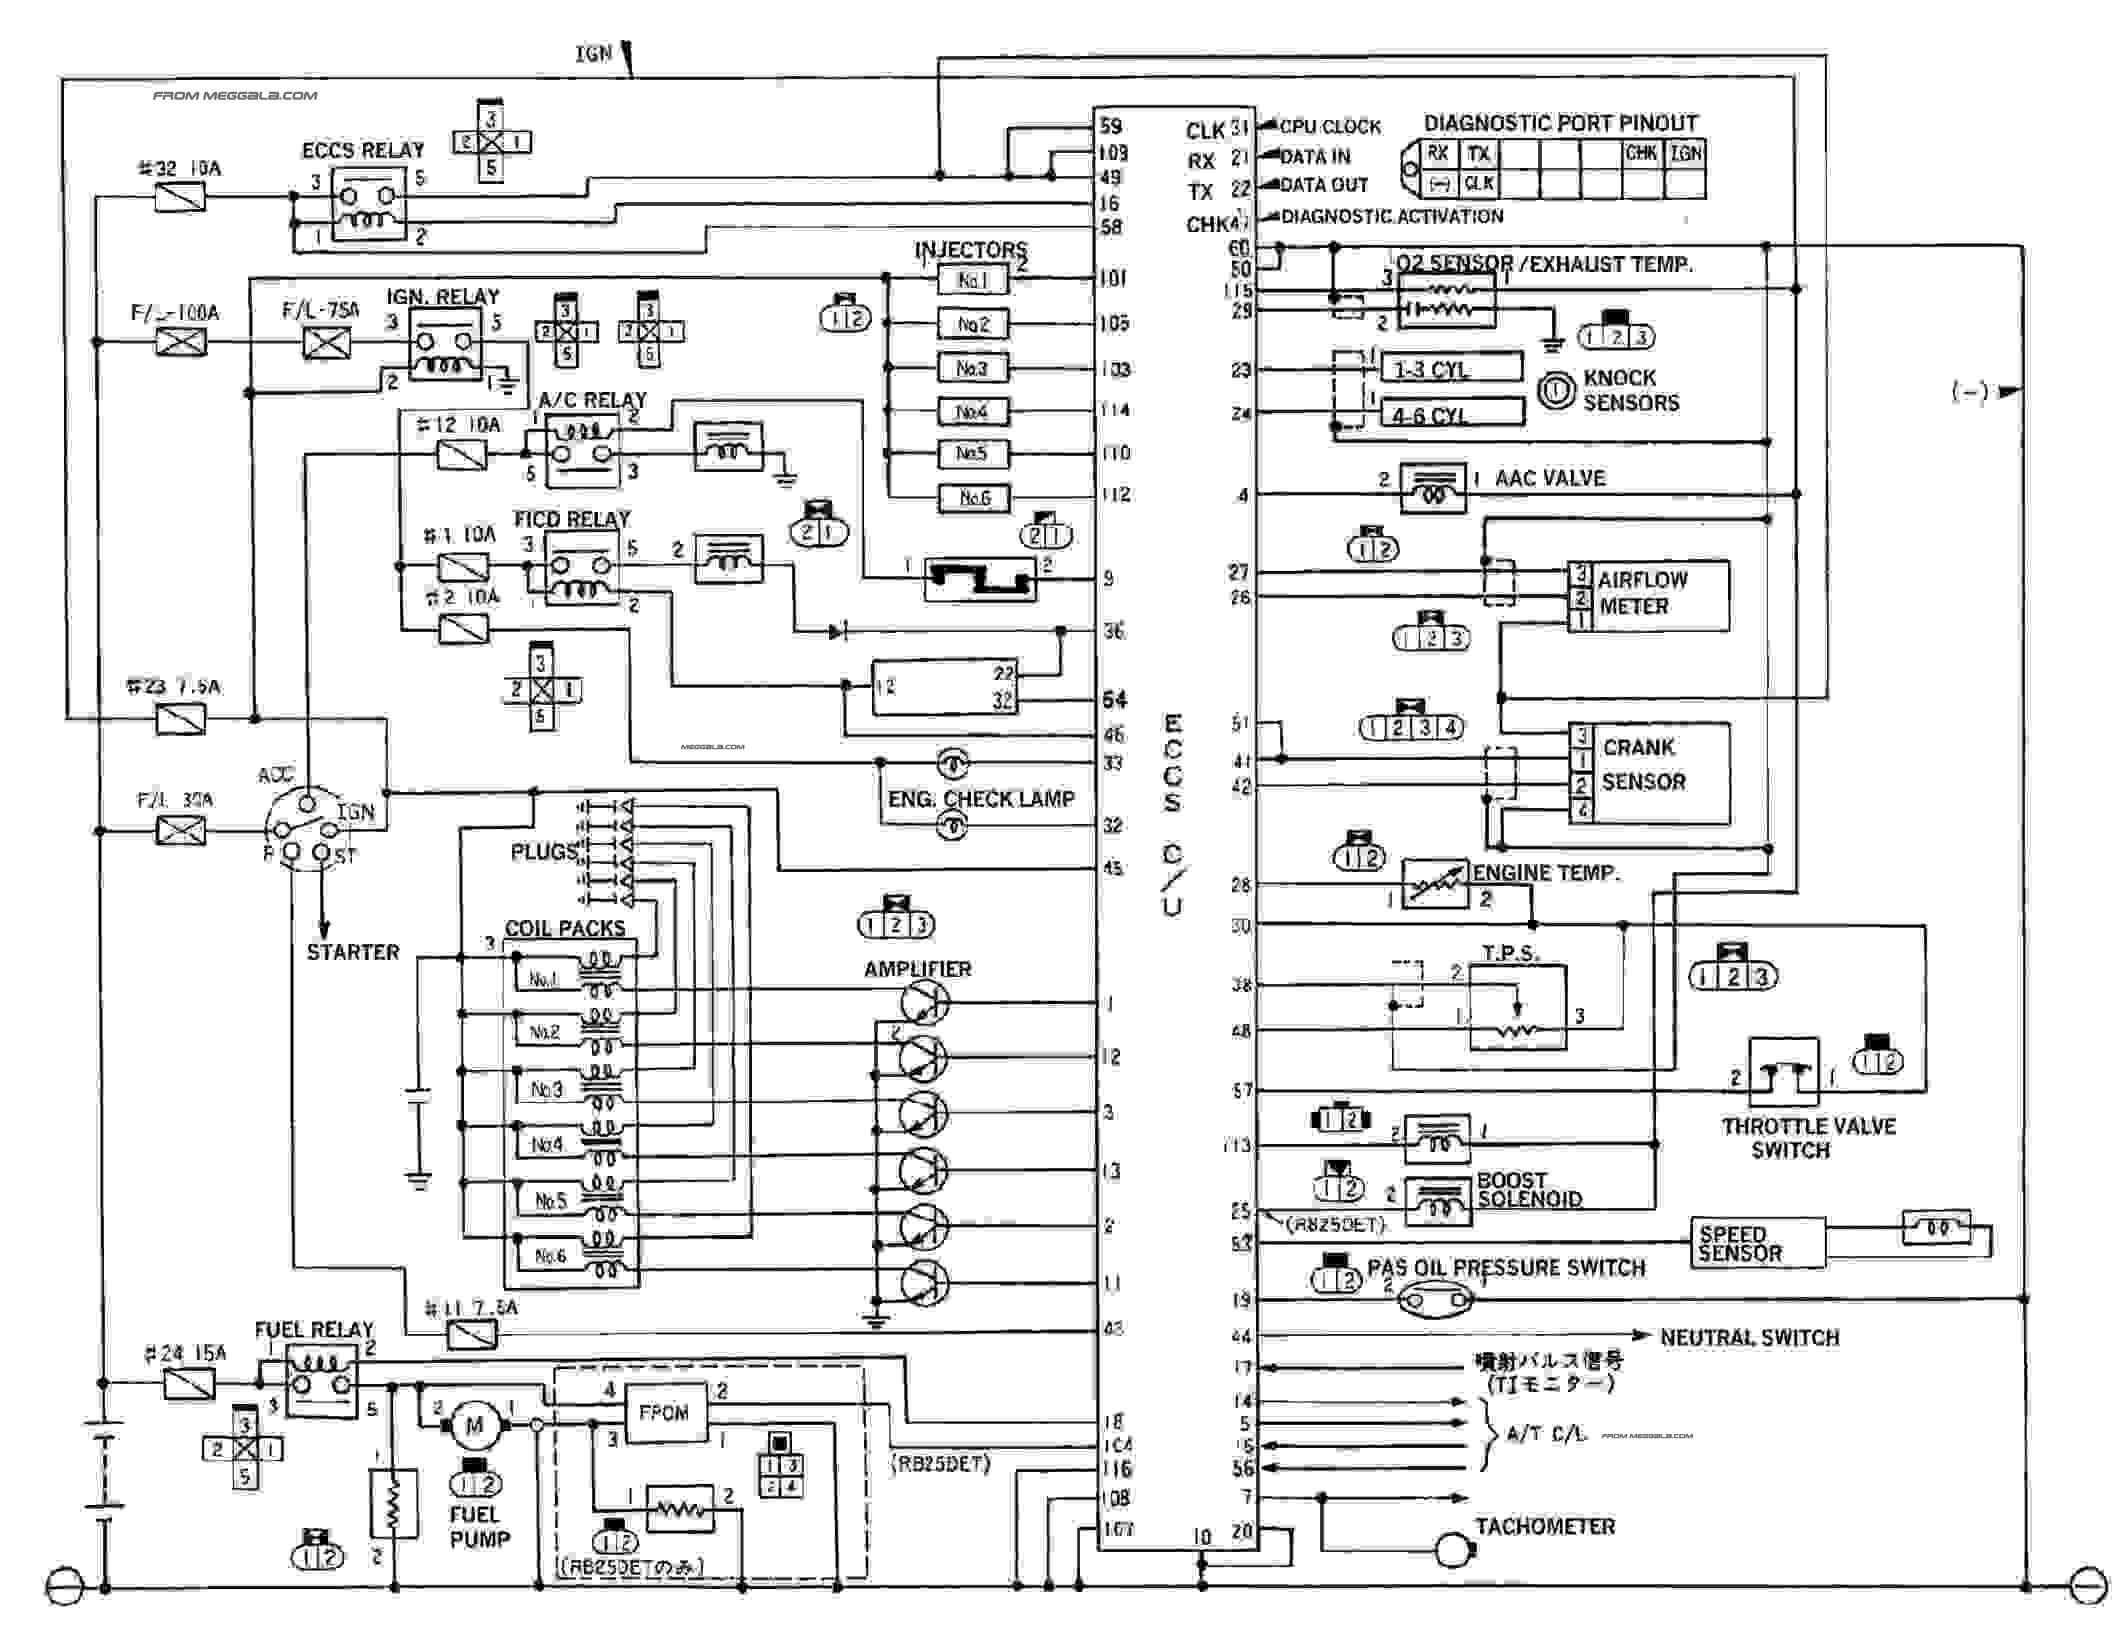 mitsubishi triton stereo wiring diagram sony cdx gt32w ecu schematic harness diagrams hubs 350z pinout nissan forum